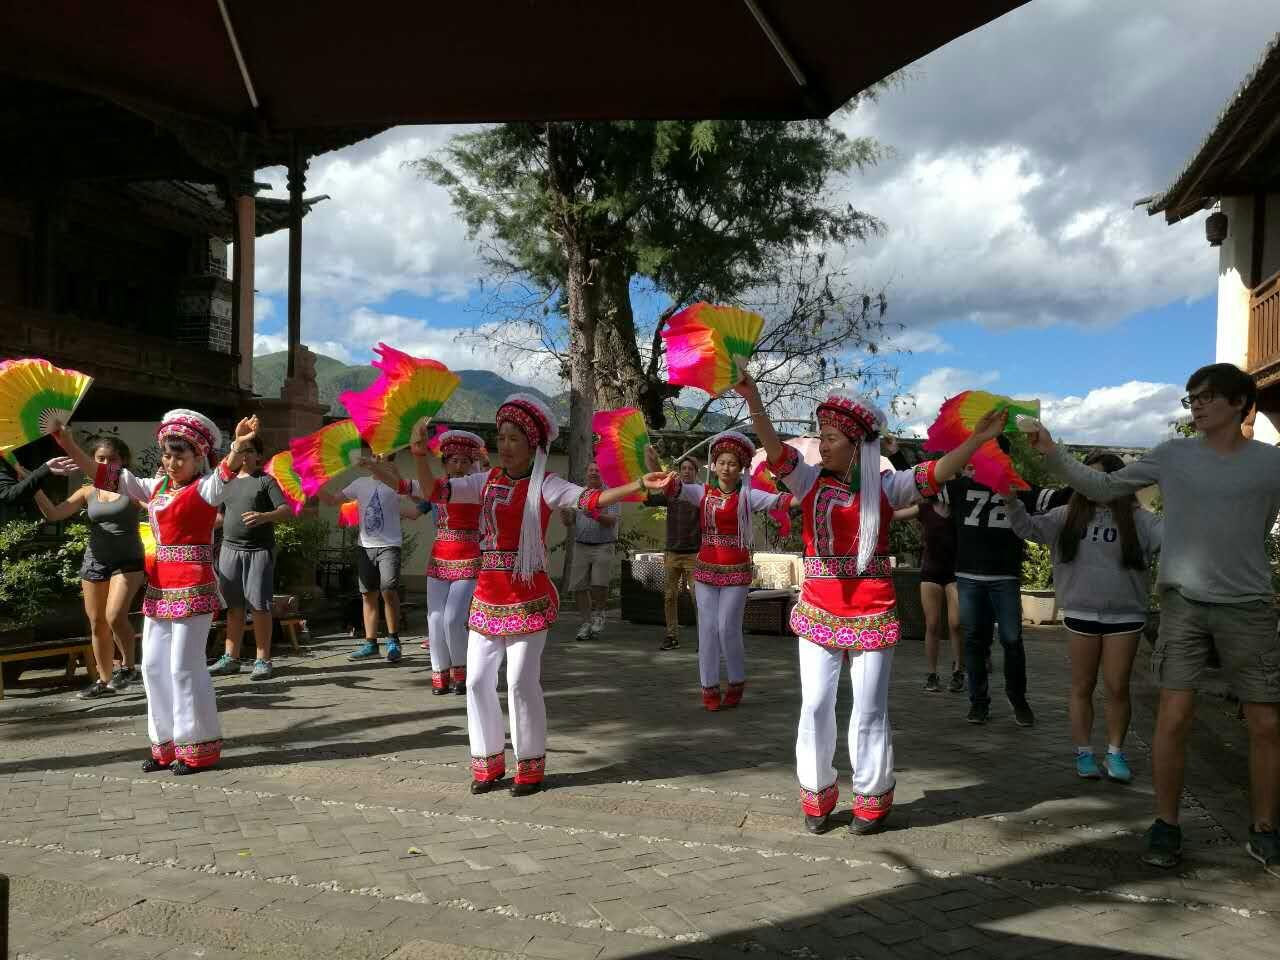 Shaxi music and dance at Old Theatre Inn - Shaxi Yunnan China